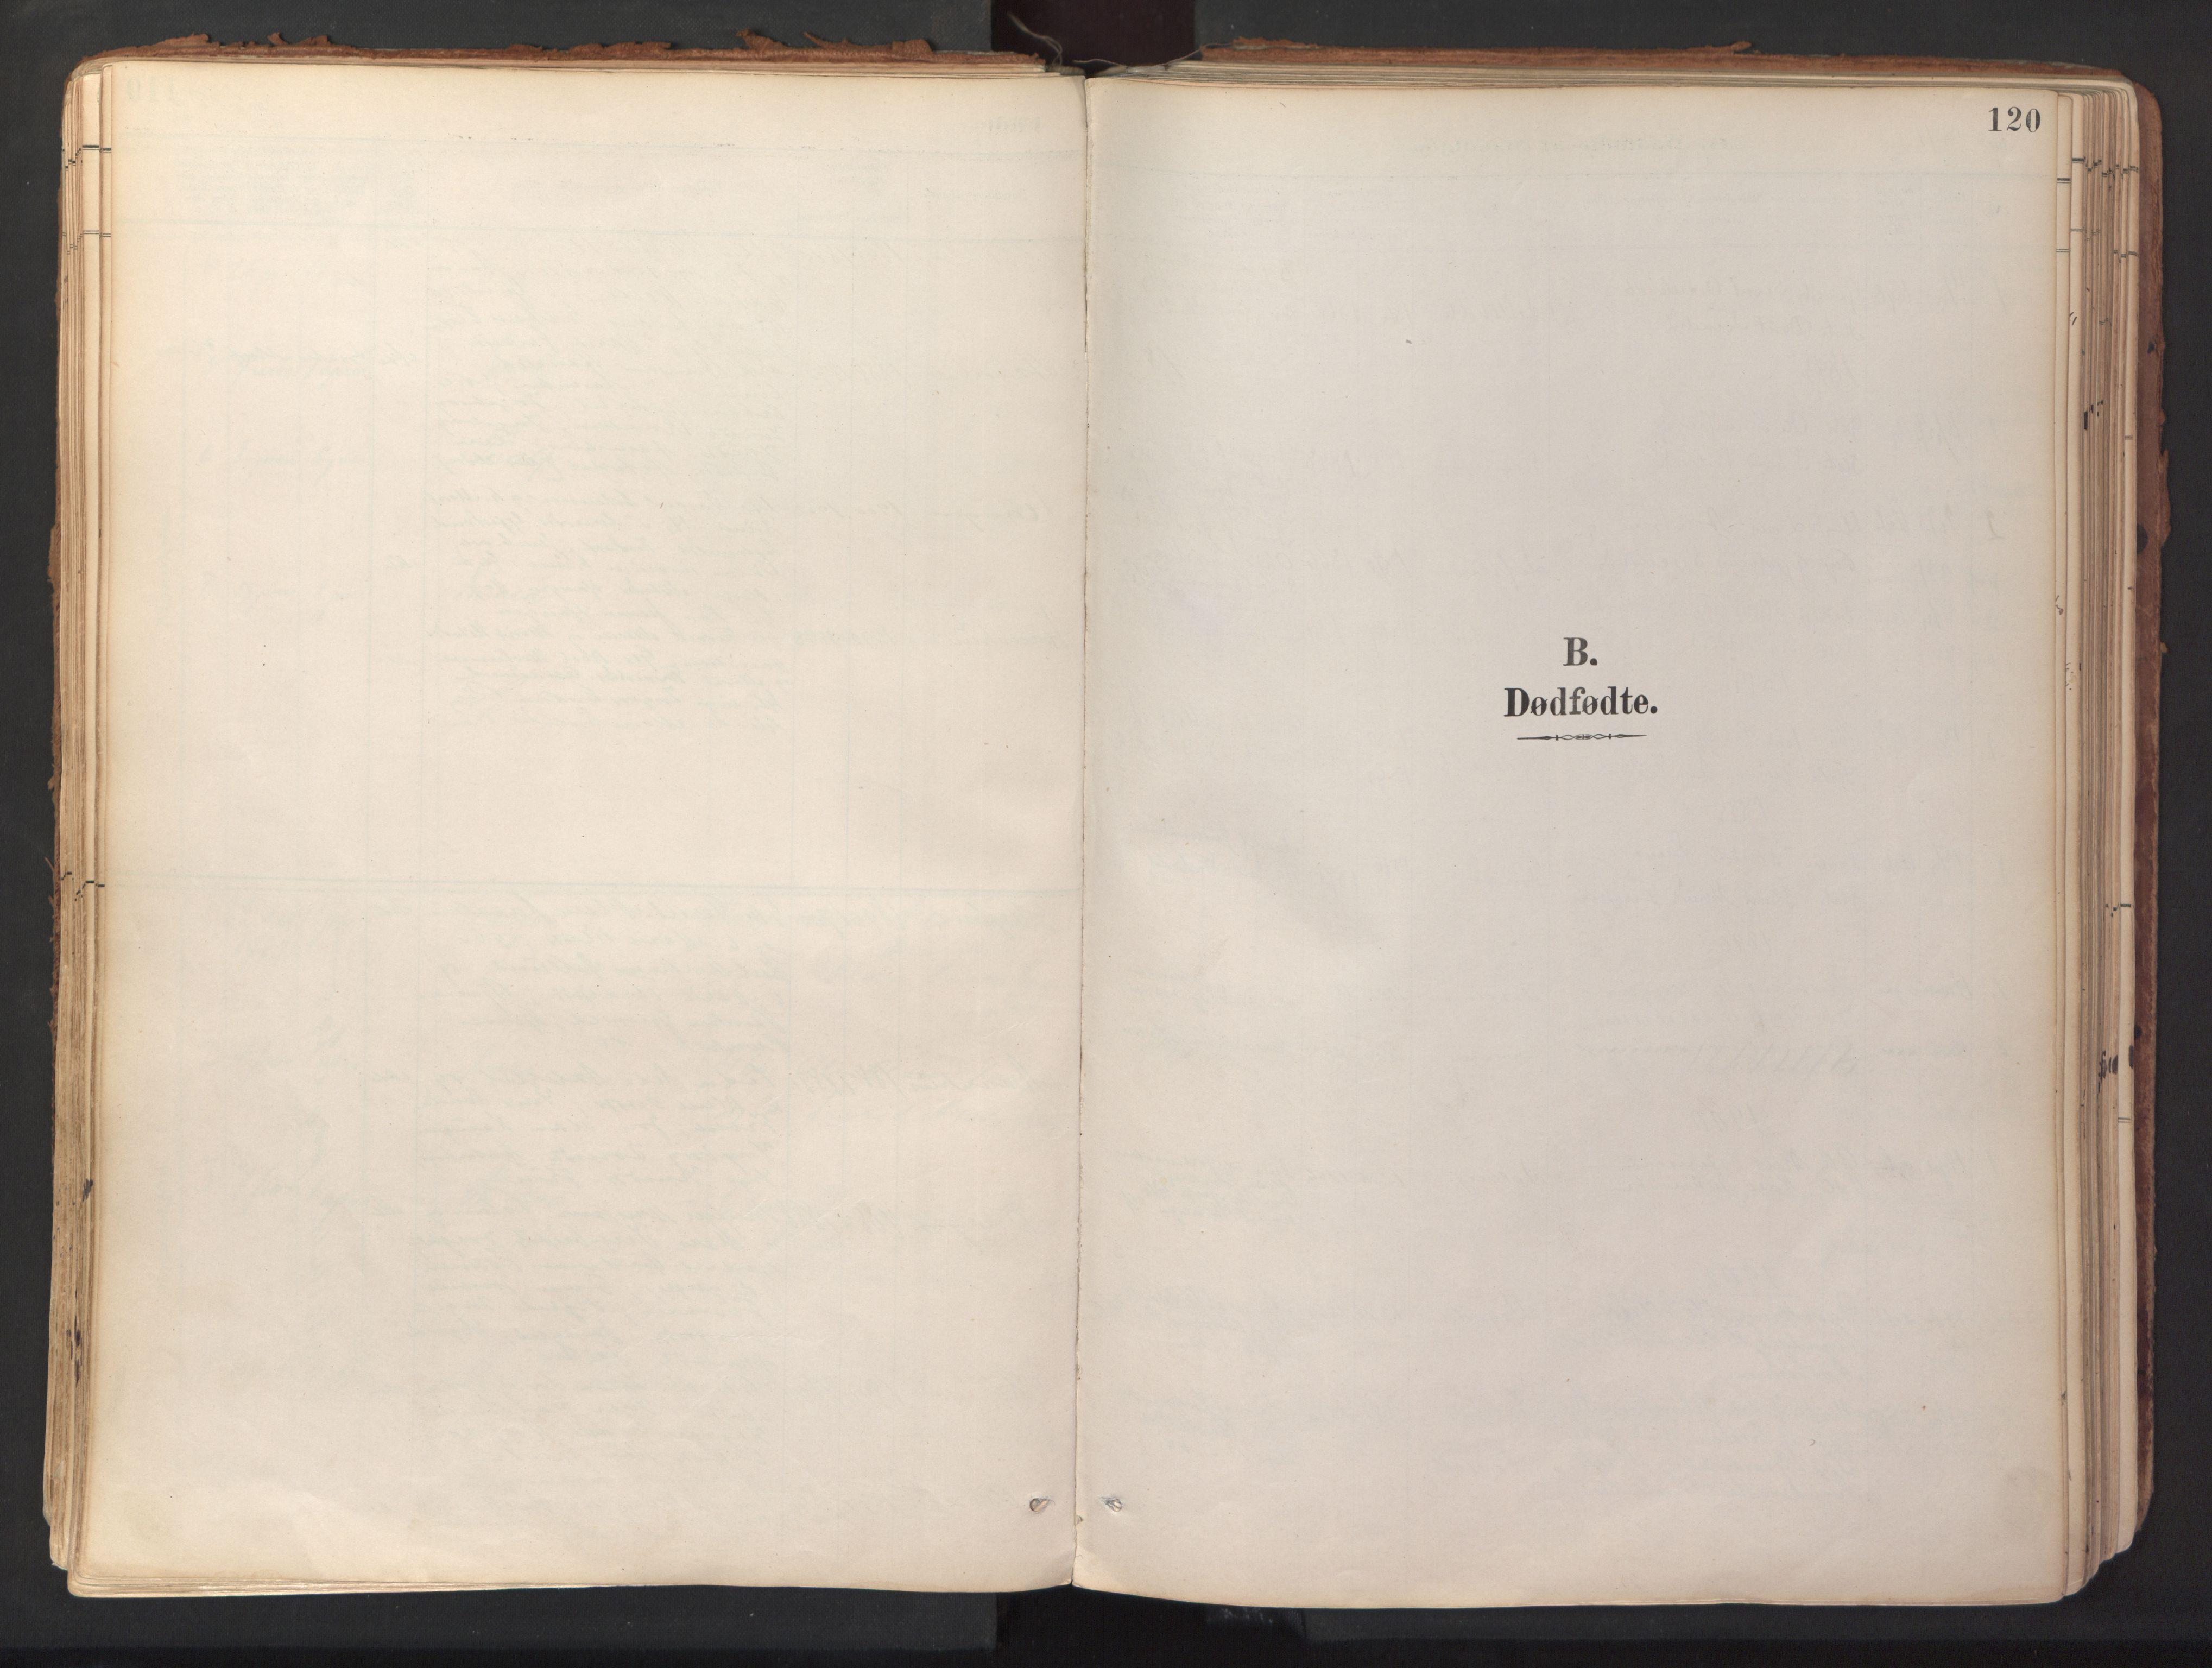 SAT, Ministerialprotokoller, klokkerbøker og fødselsregistre - Sør-Trøndelag, 689/L1041: Parish register (official) no. 689A06, 1891-1923, p. 120